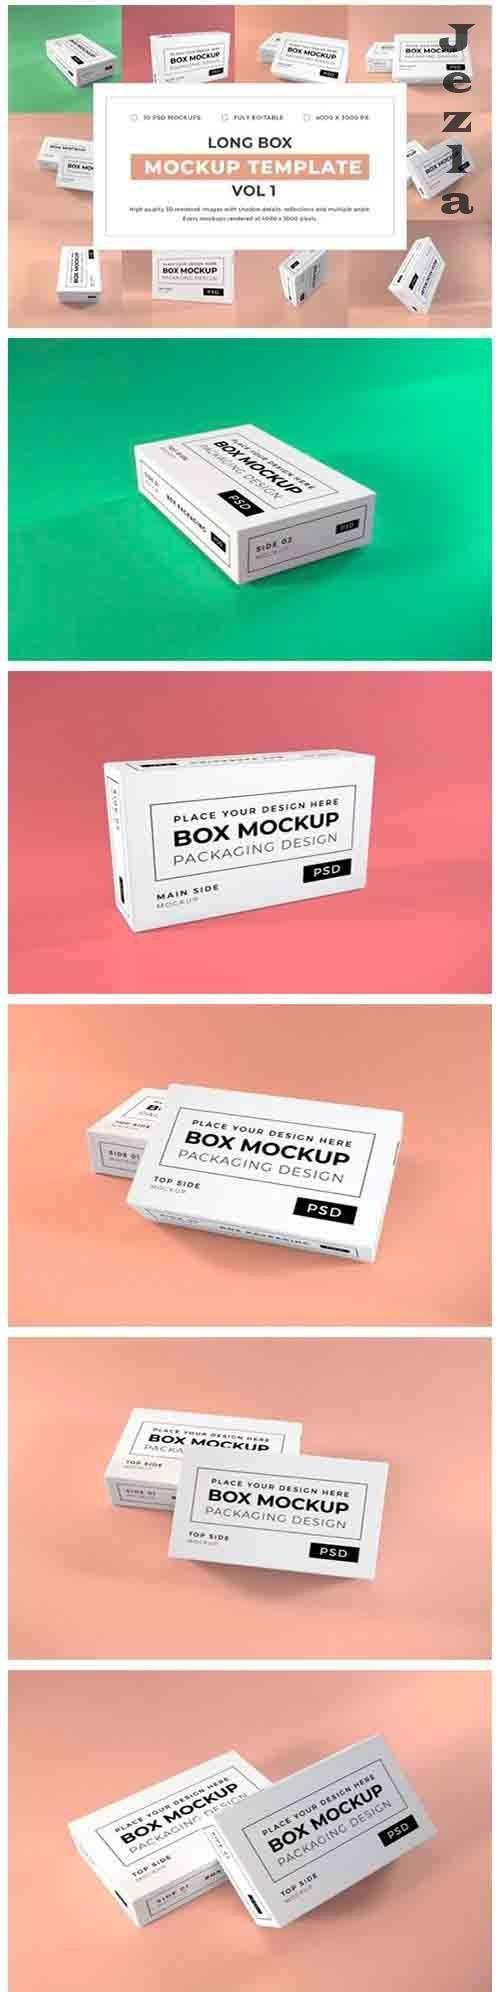 Long Box Packaging Mockup Template Bundle Vol 1 - 1053084